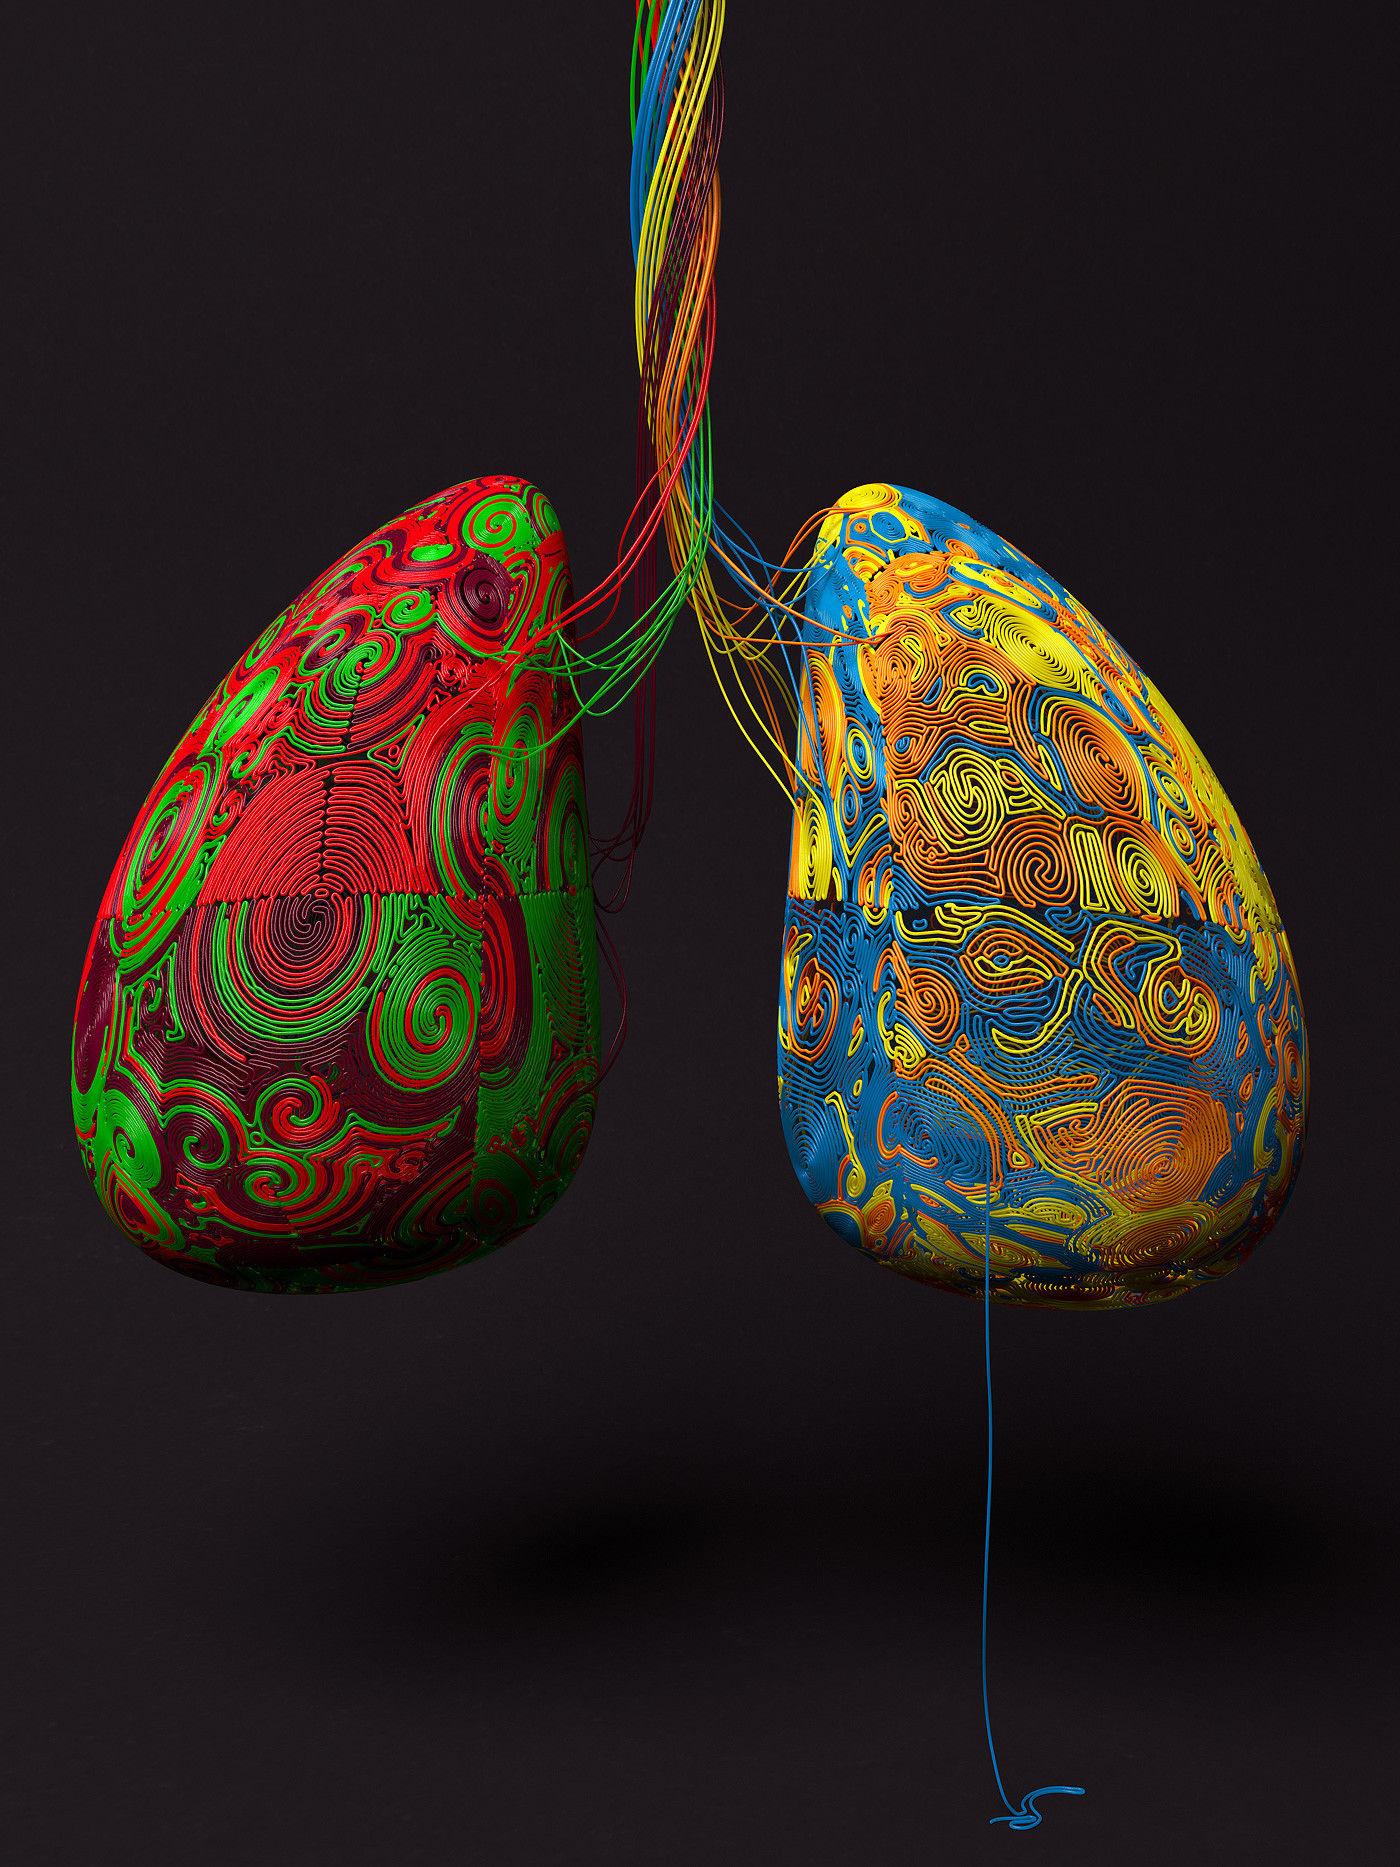 Organic Food - Licorice Lung